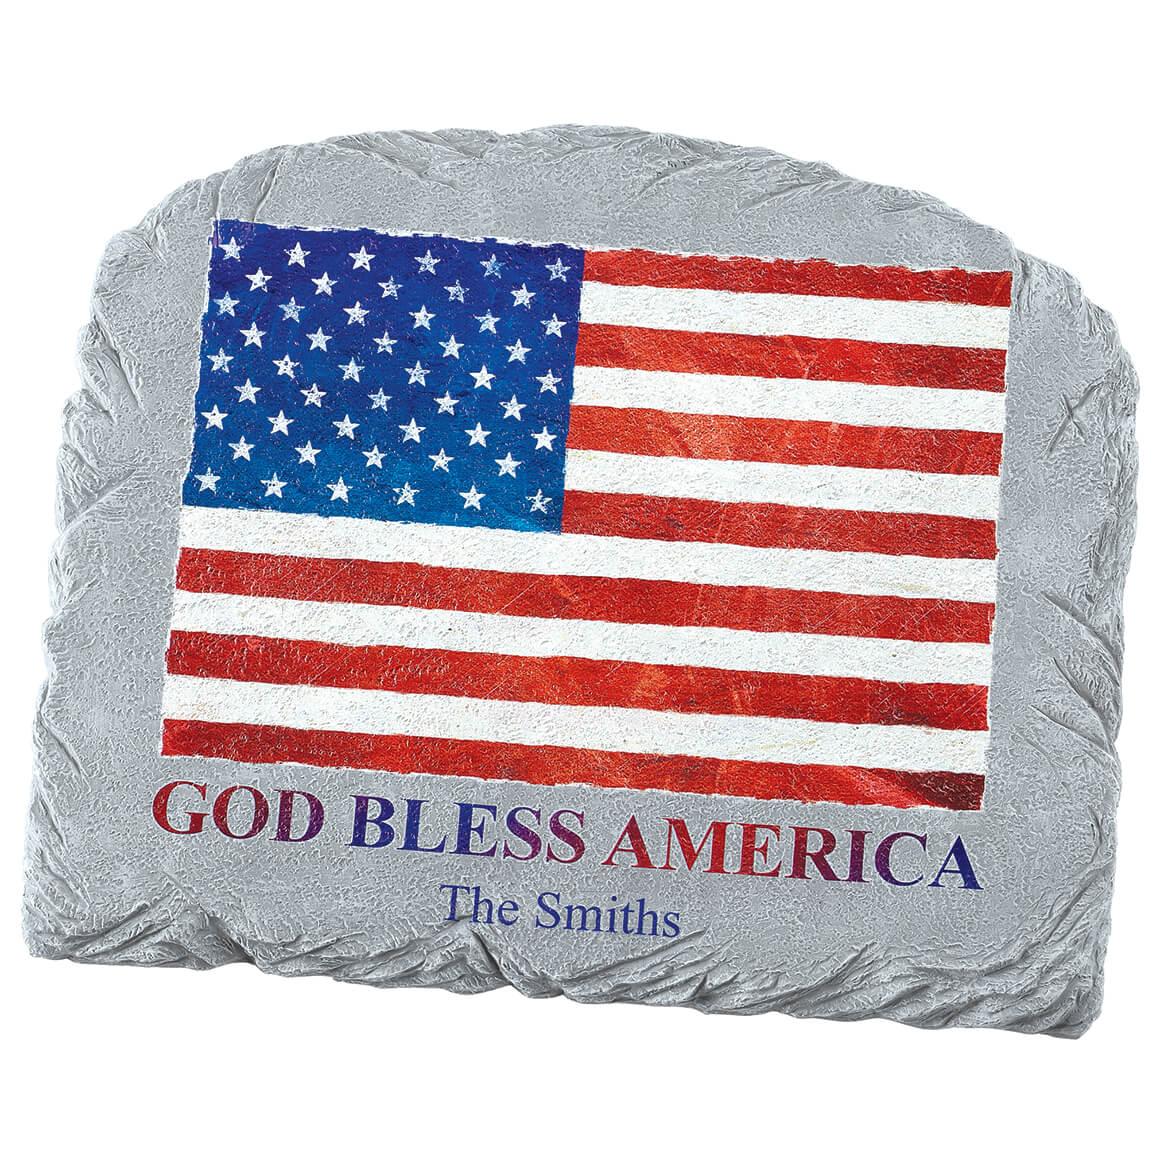 Personalized God Bless America Flag Garden Stone-371658